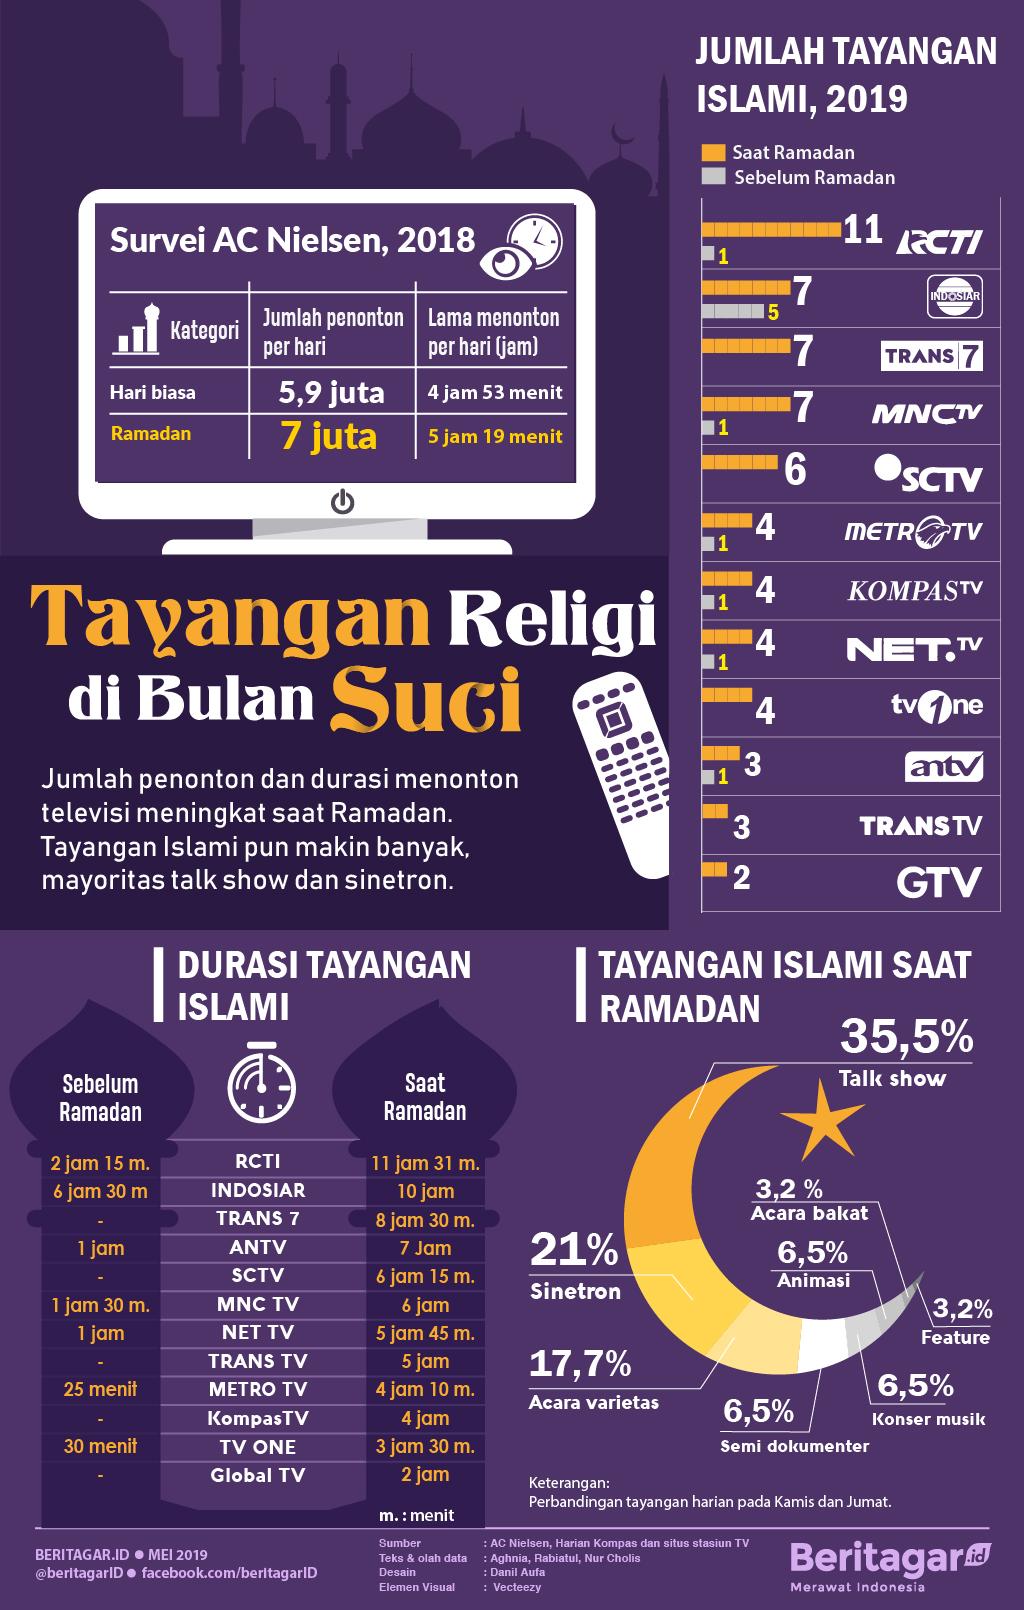 Infografis Tayangan Religi di Bulan Suci